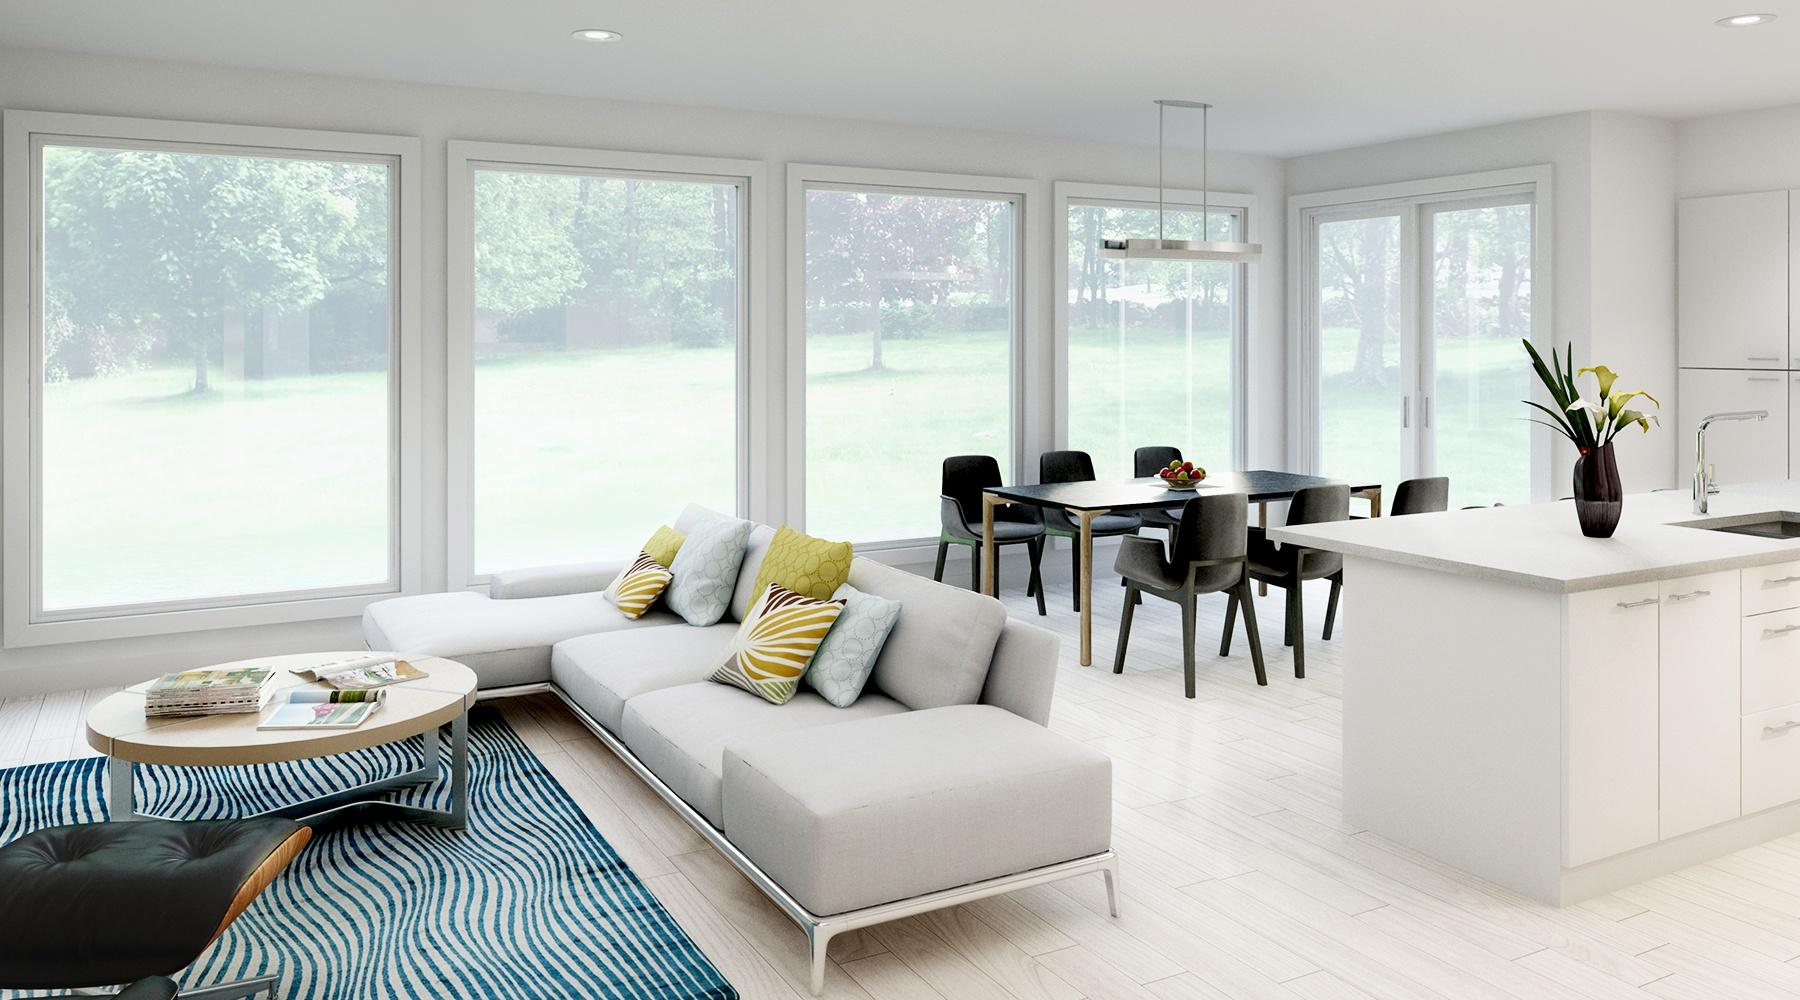 Kanvi Homes ELEMENT model